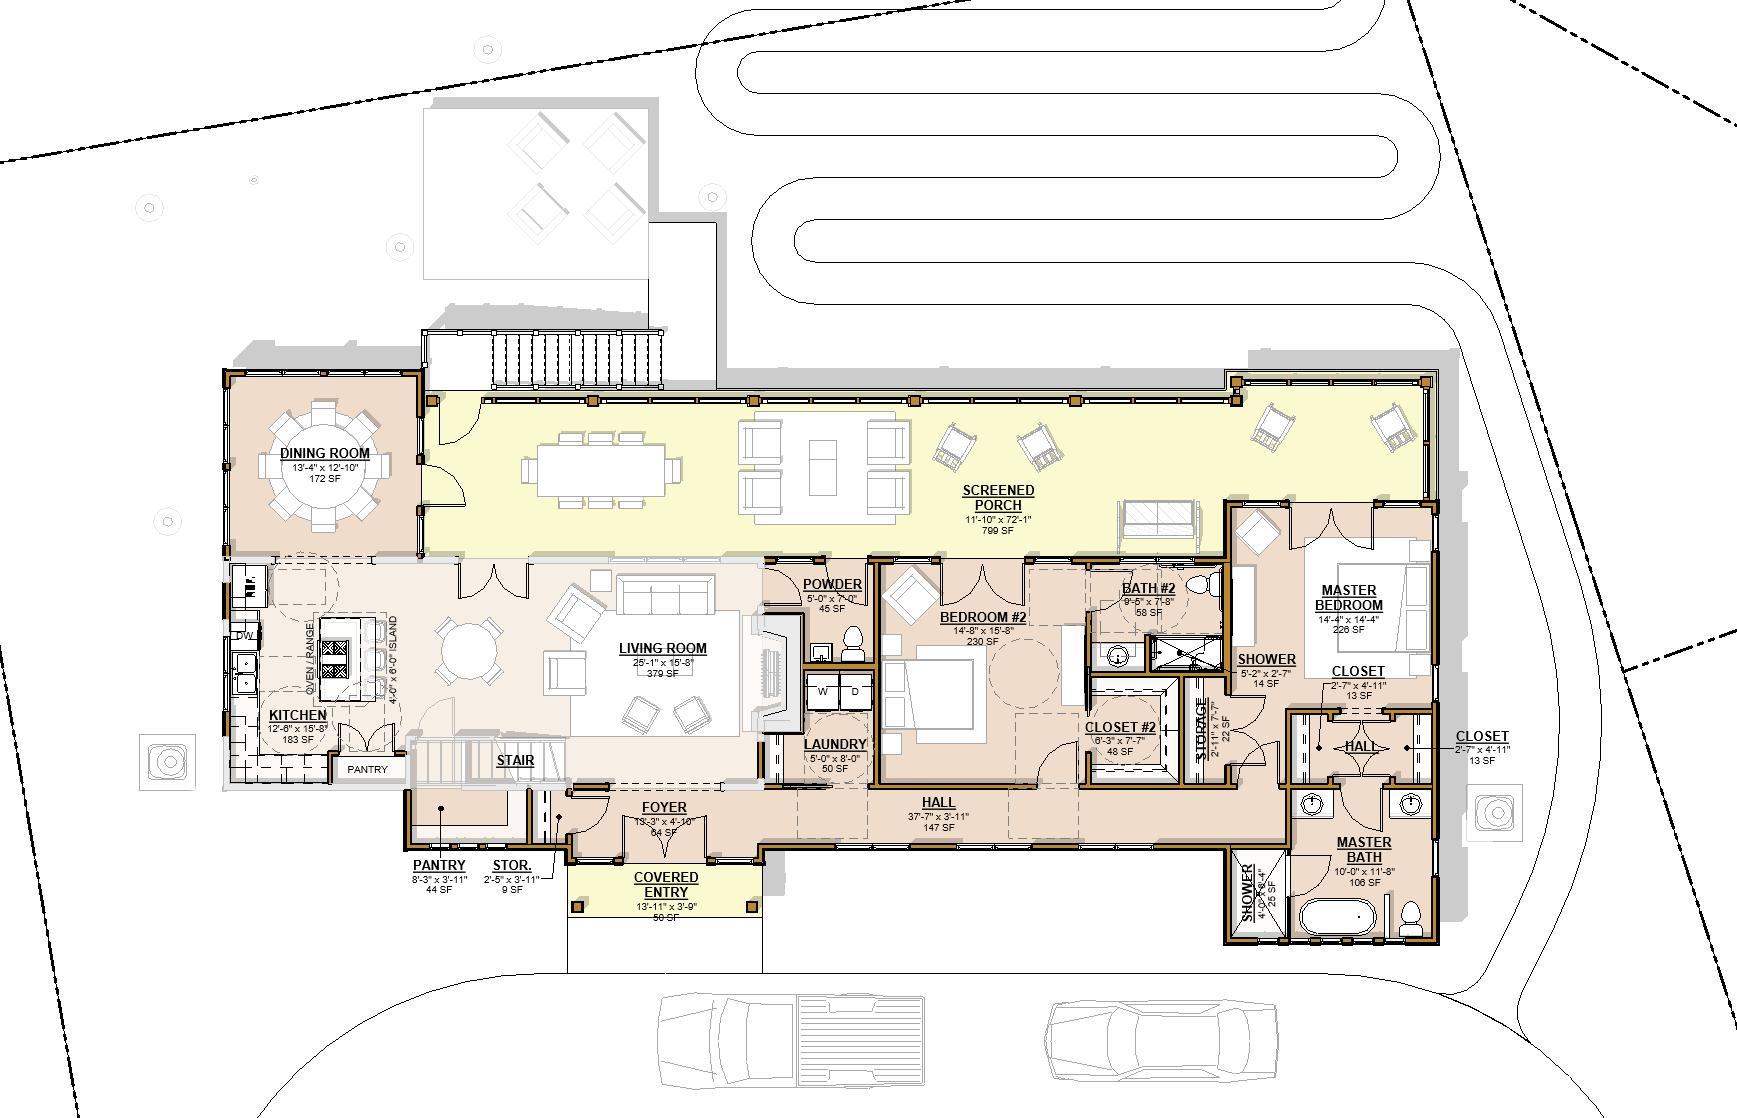 2031_ - Floor Plan - Level 1 - Pres